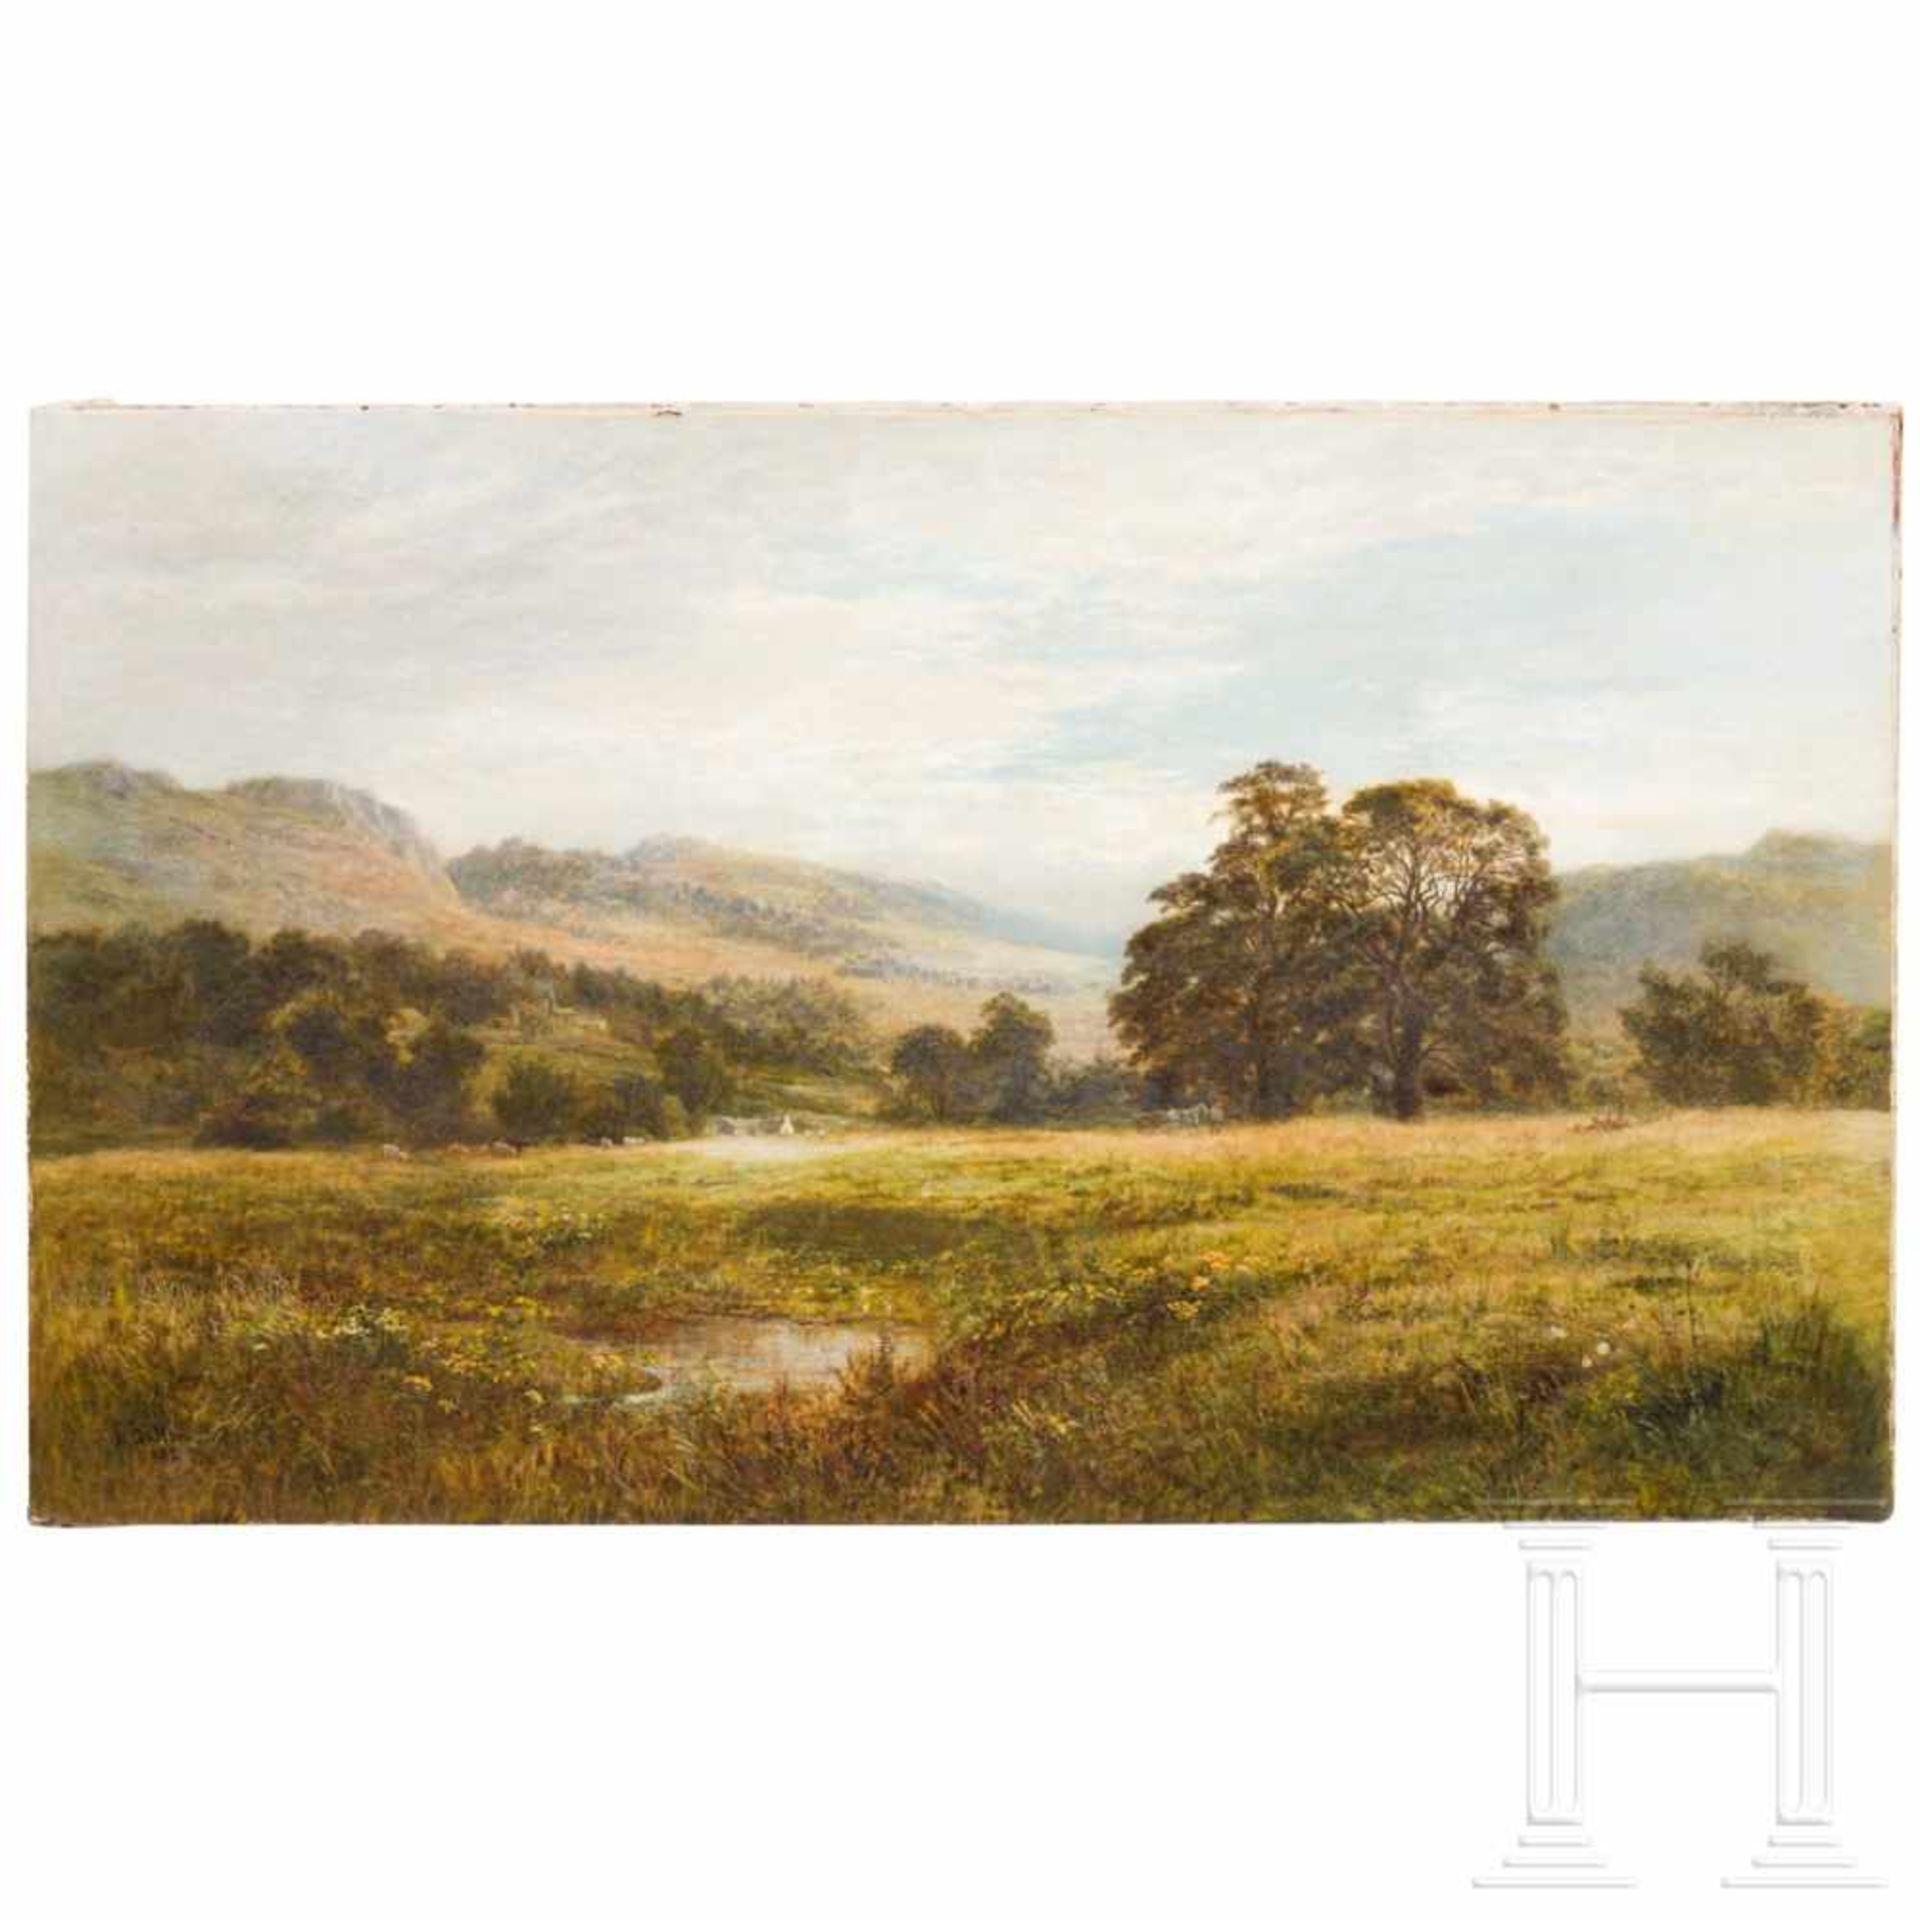 Los 49 - Robert Gallon (1845 – 1925) – an English landscape, dated 1882Öl auf Leinwand. Sumpfiger Talgrund